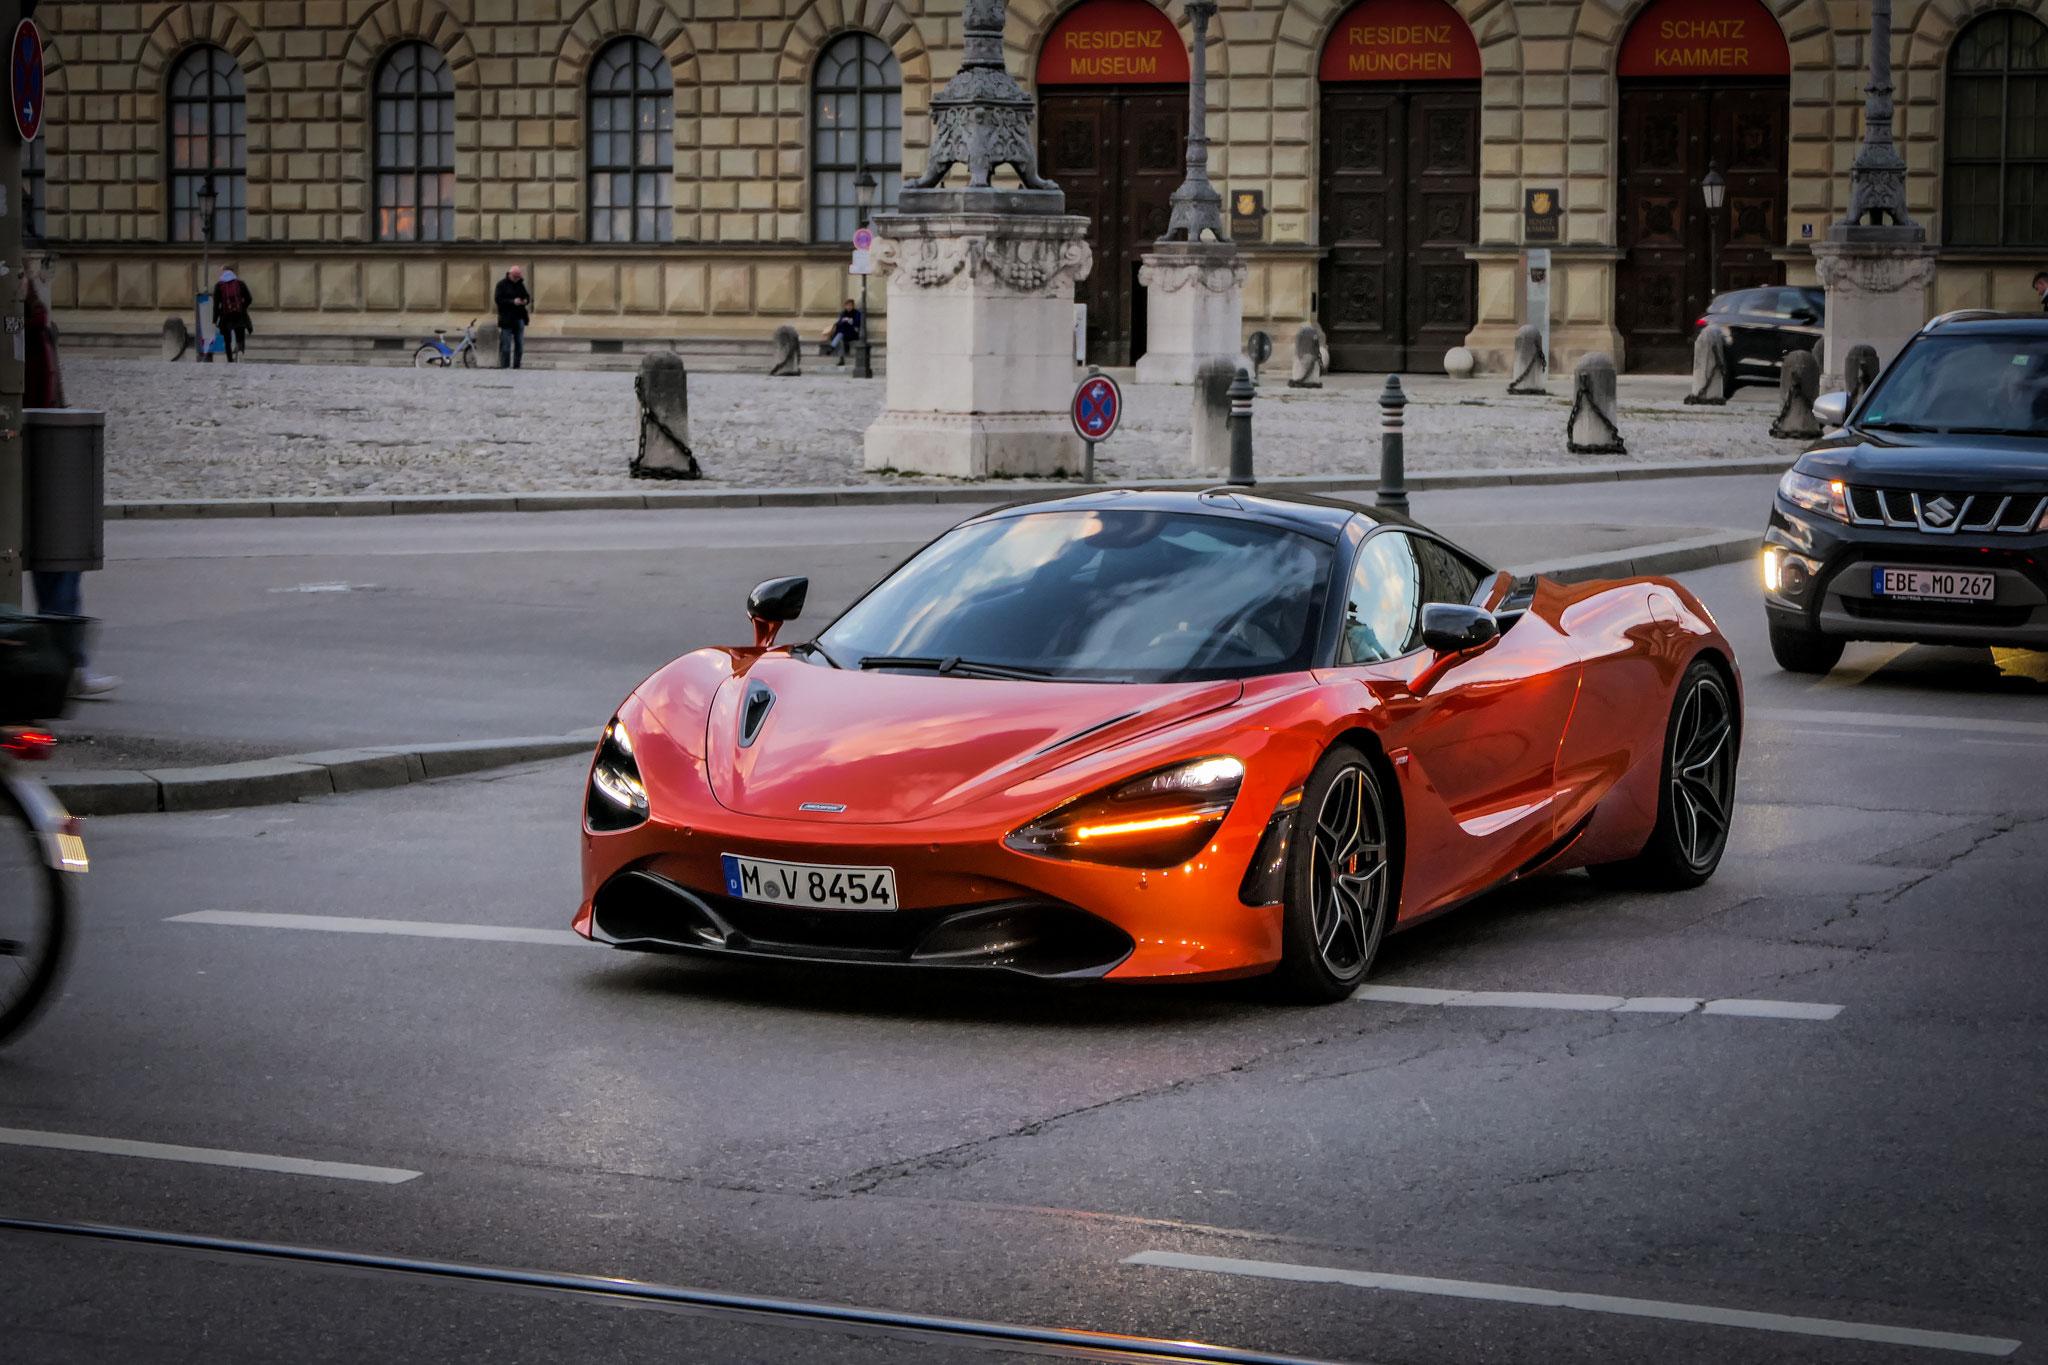 McLaren 720S - M-V-8454